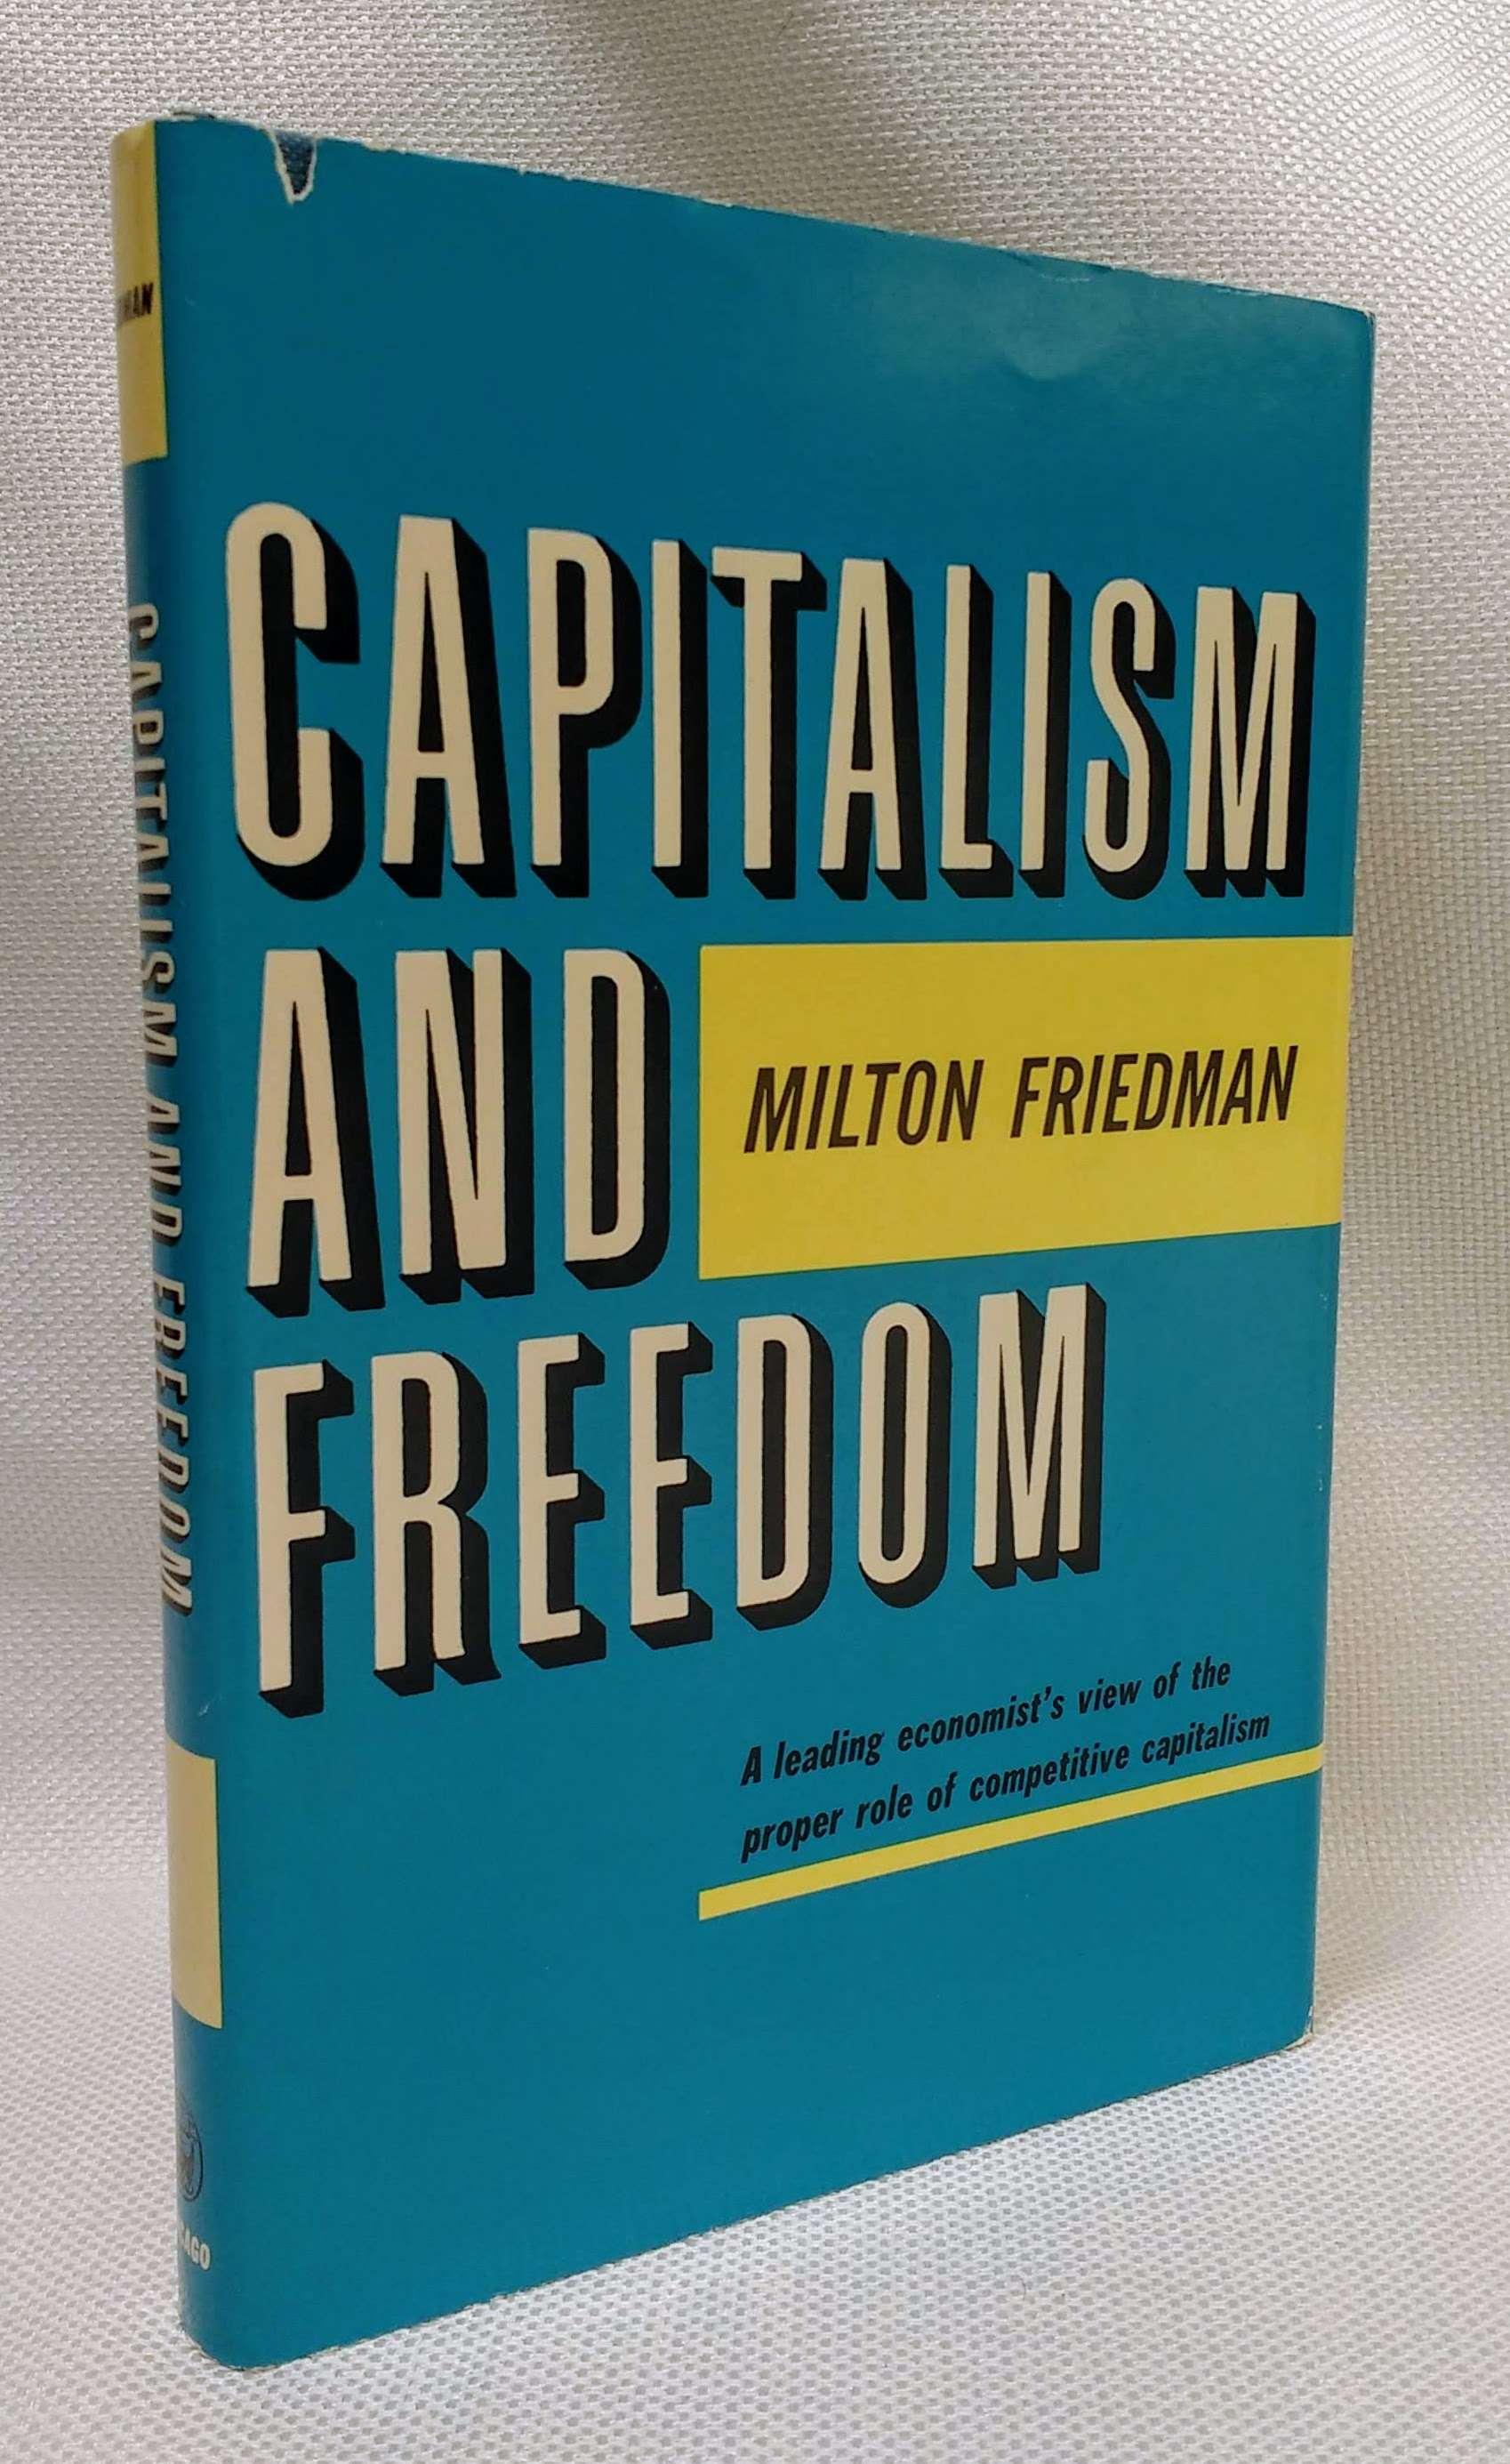 Capitalism and Freedom, Friedman, Milton